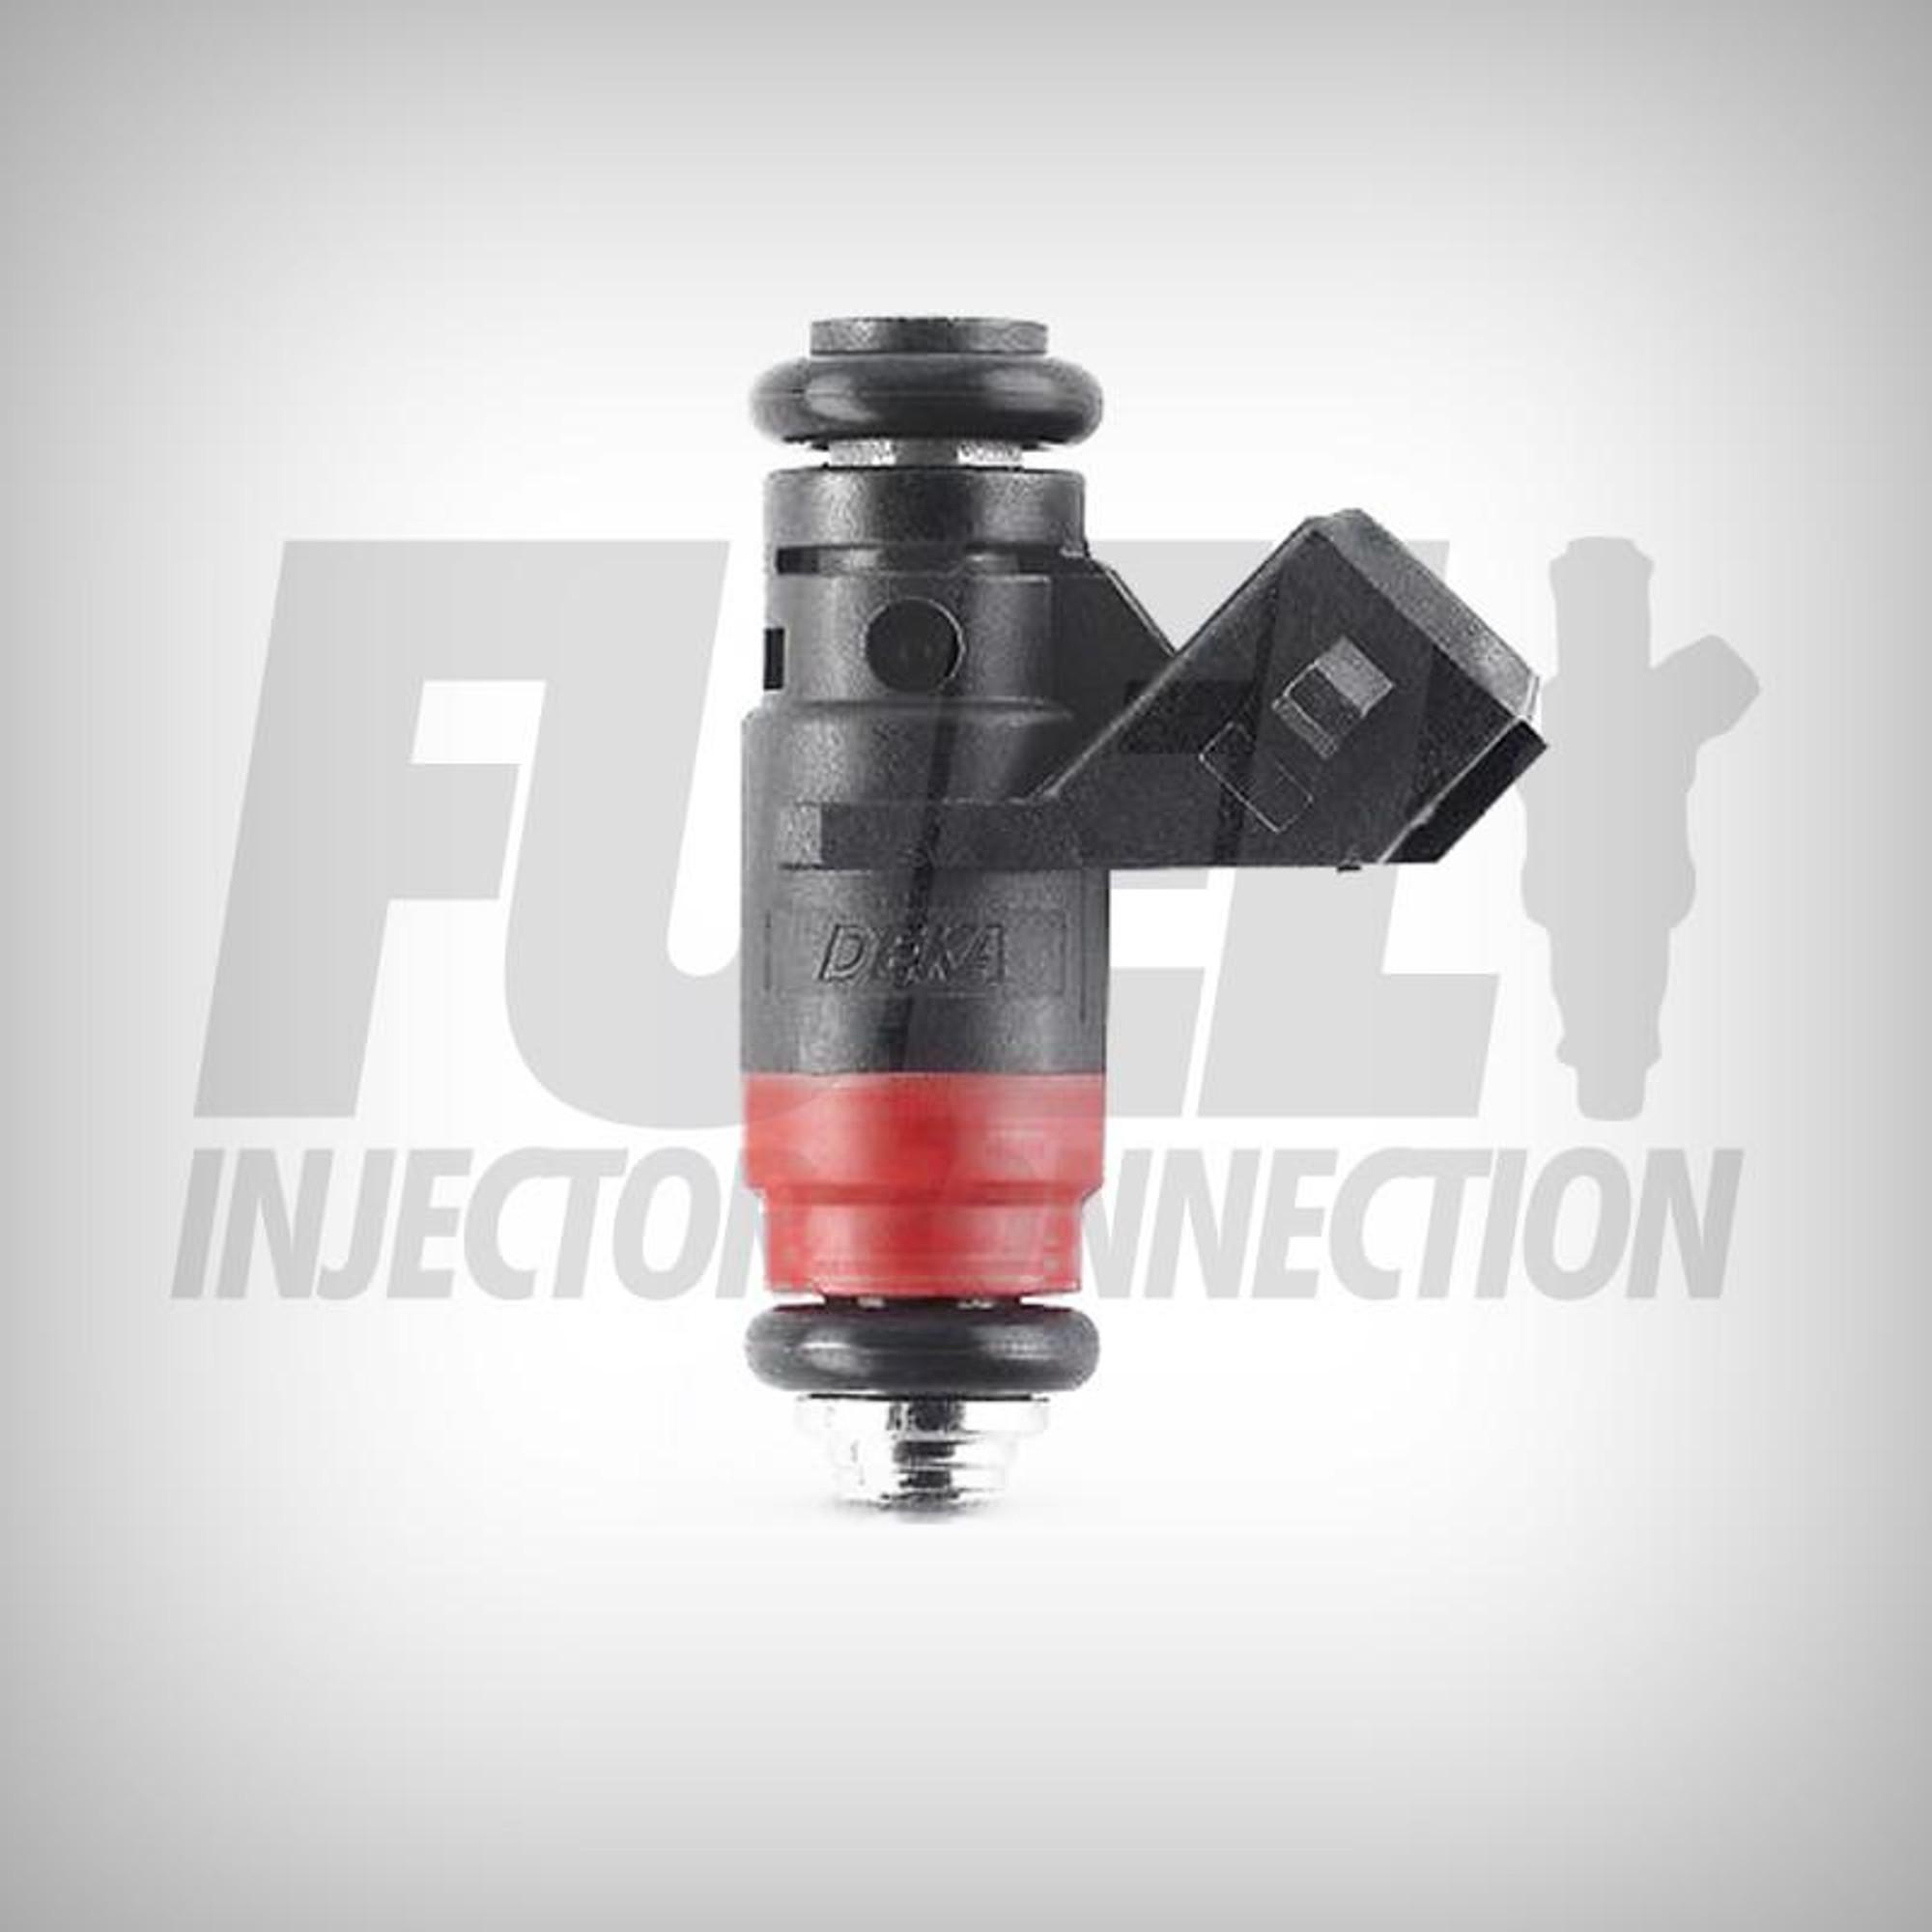 Fuel Injector Connection 80LB Siemens Deka EV1 Shorty Injector